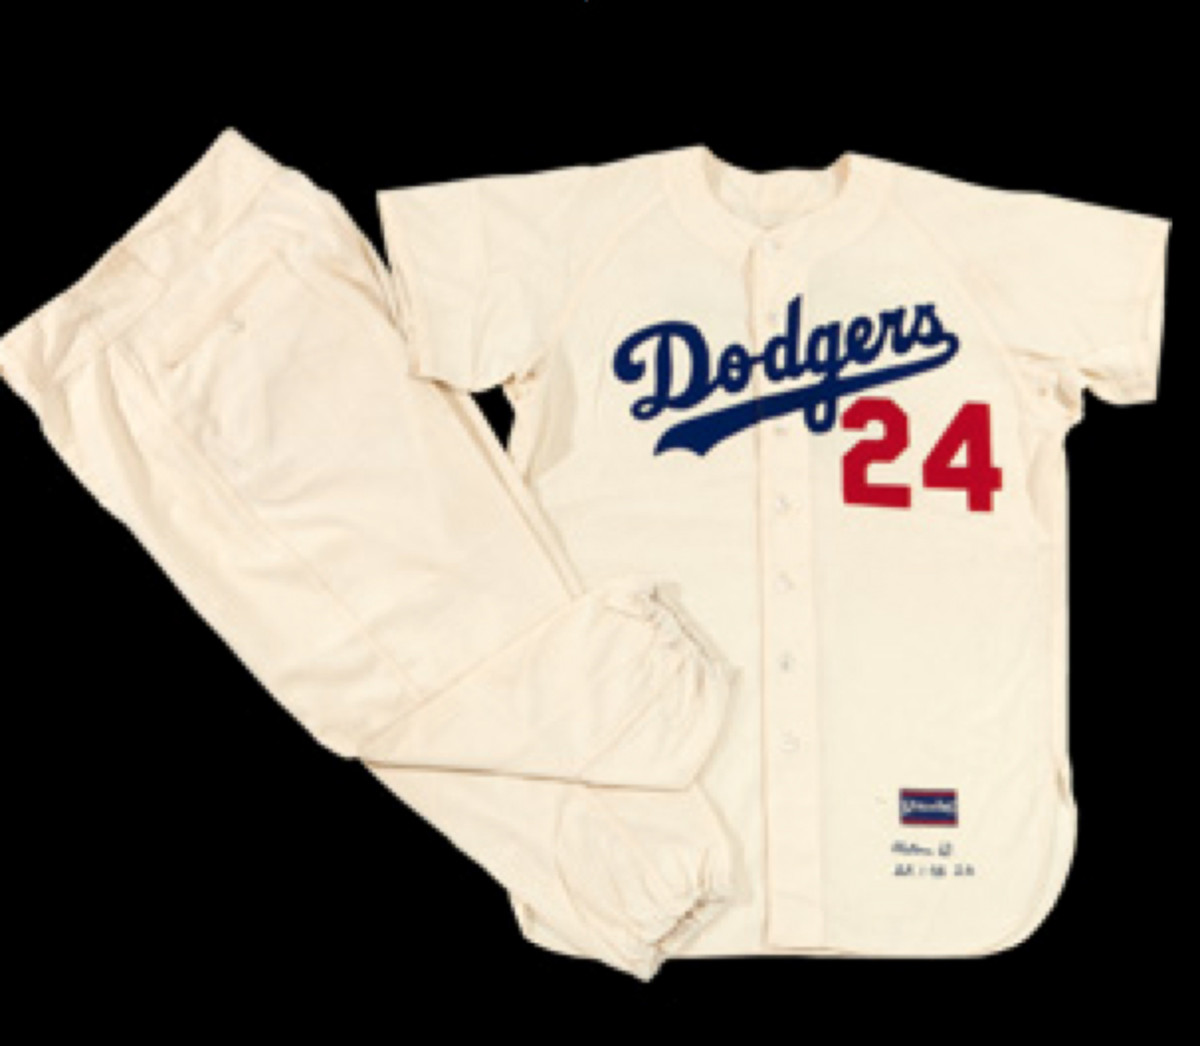 Alston 63 jersey